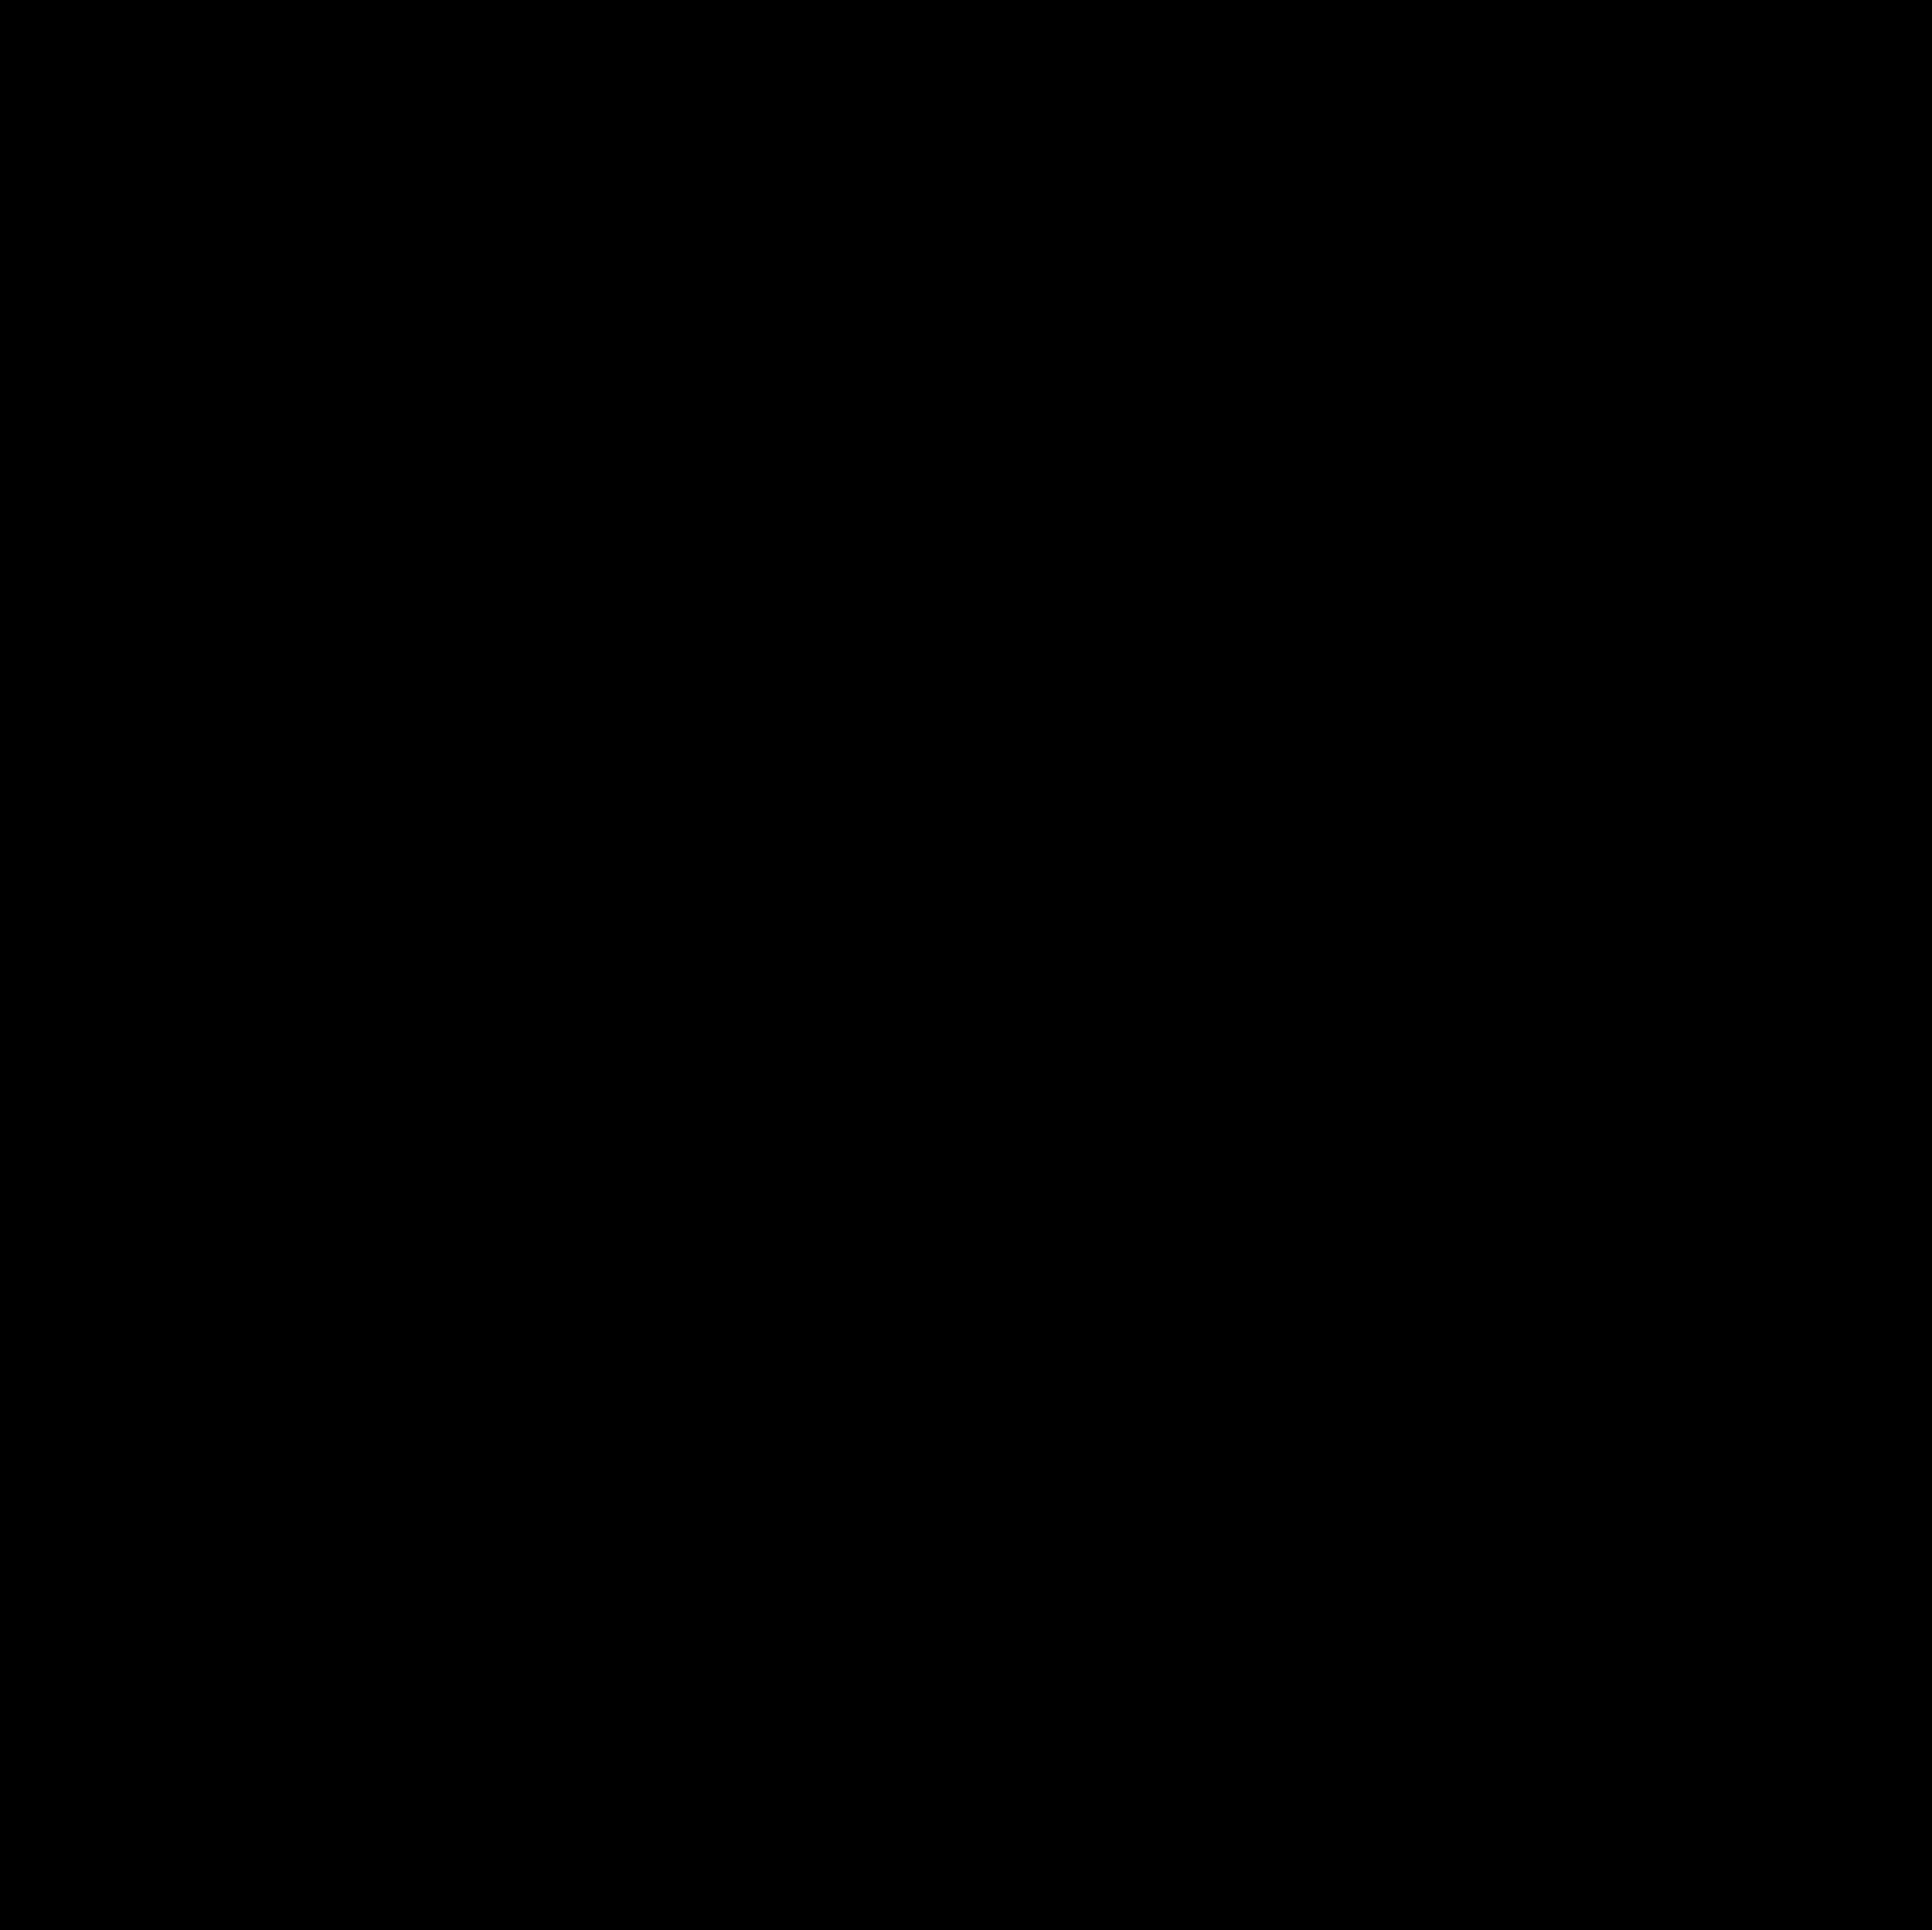 Google Stadia Black White Logo  PNG Image